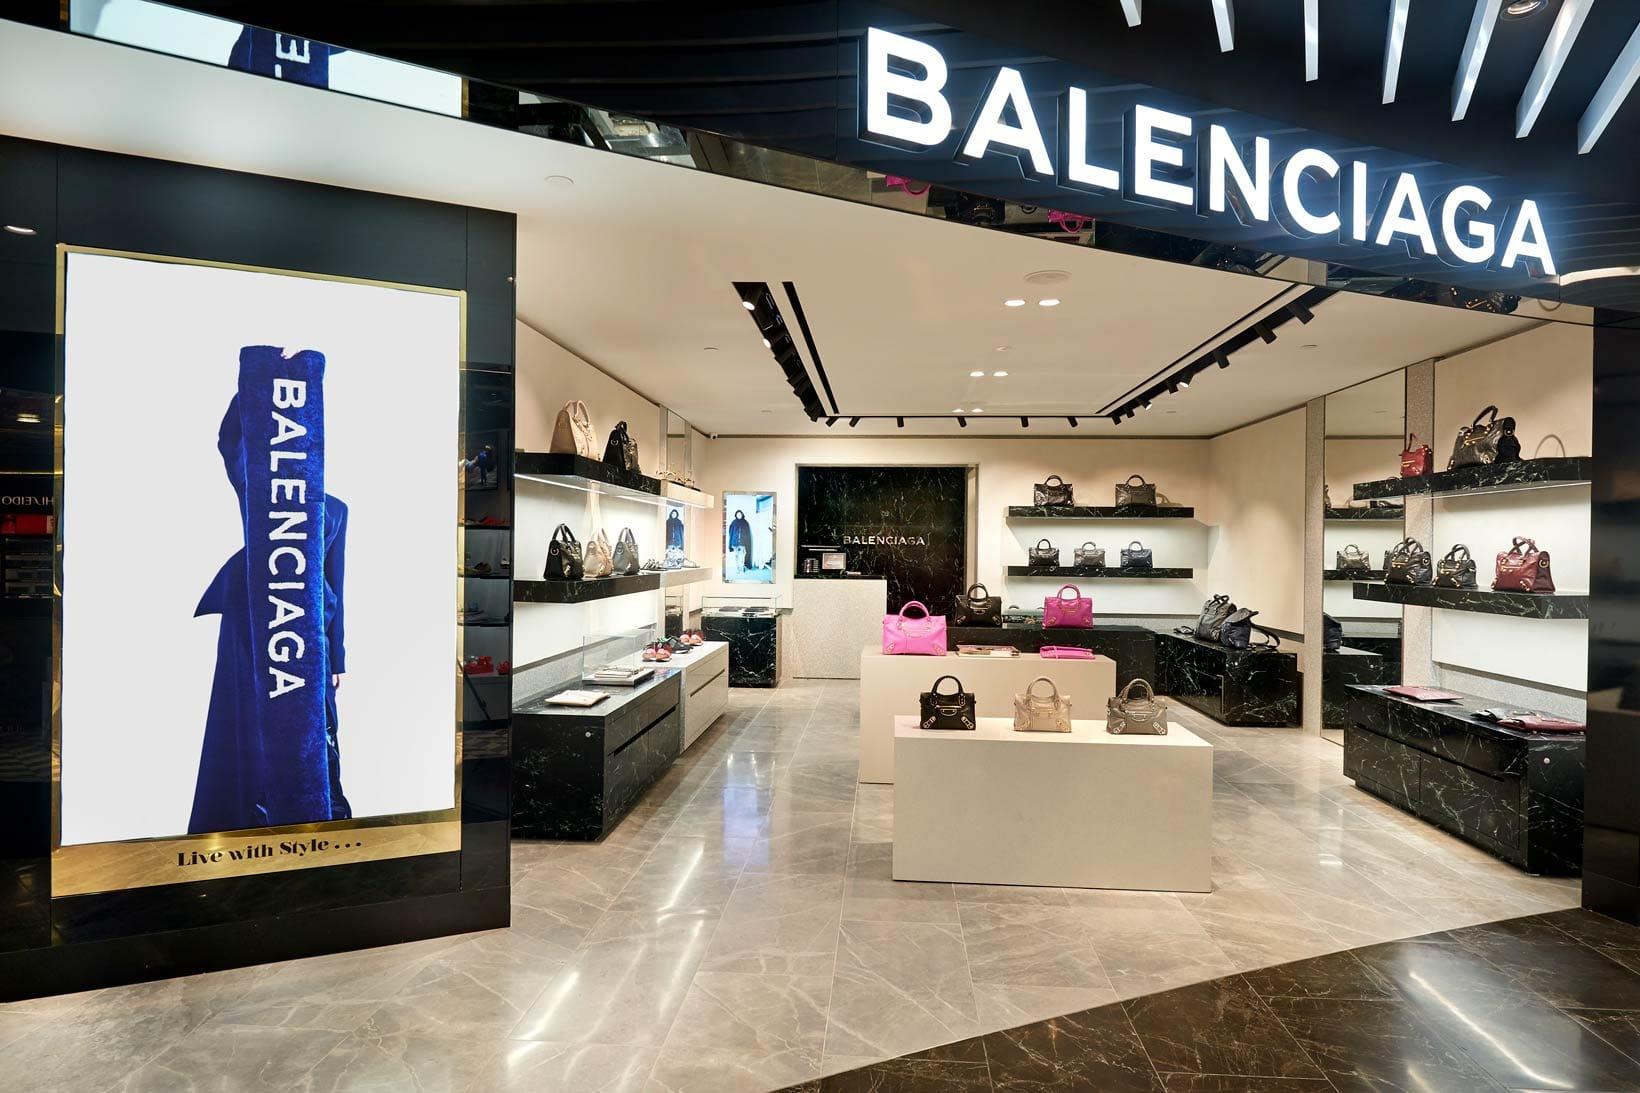 Balenciaga Issues Apology for